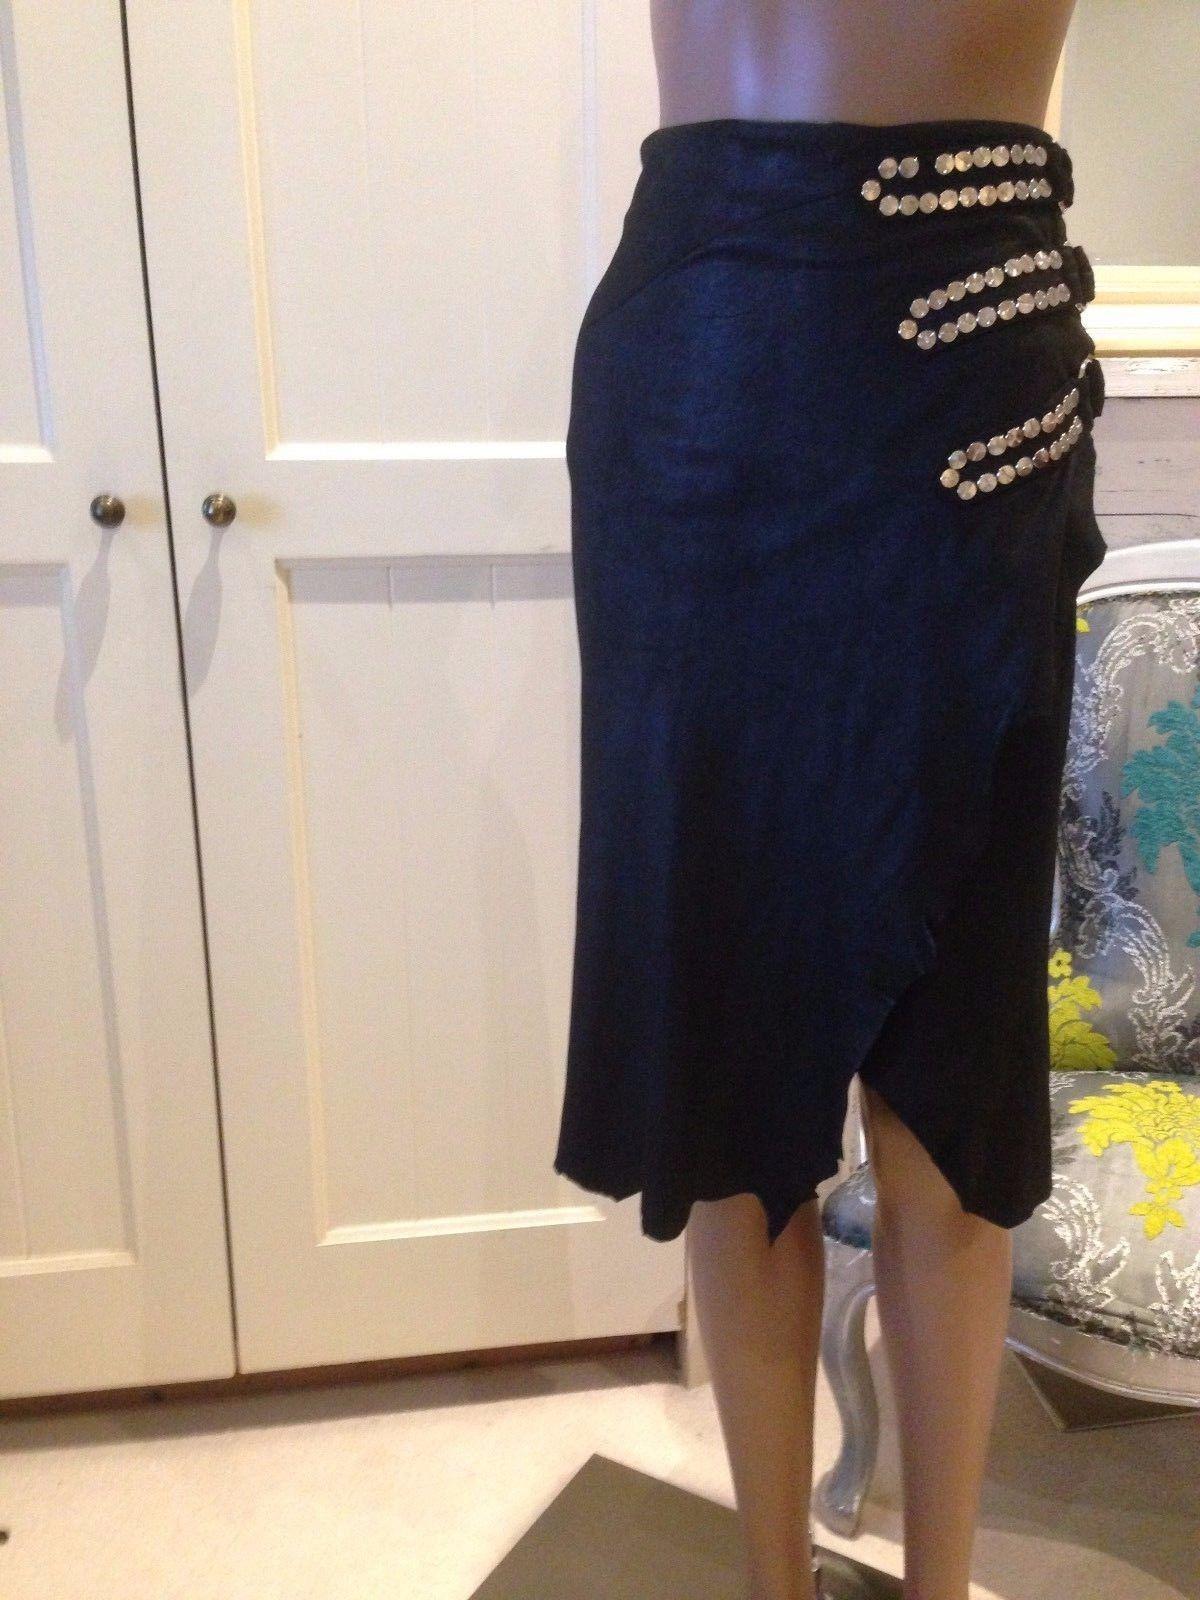 Balmain Goat leather skirt RRP 2900.00